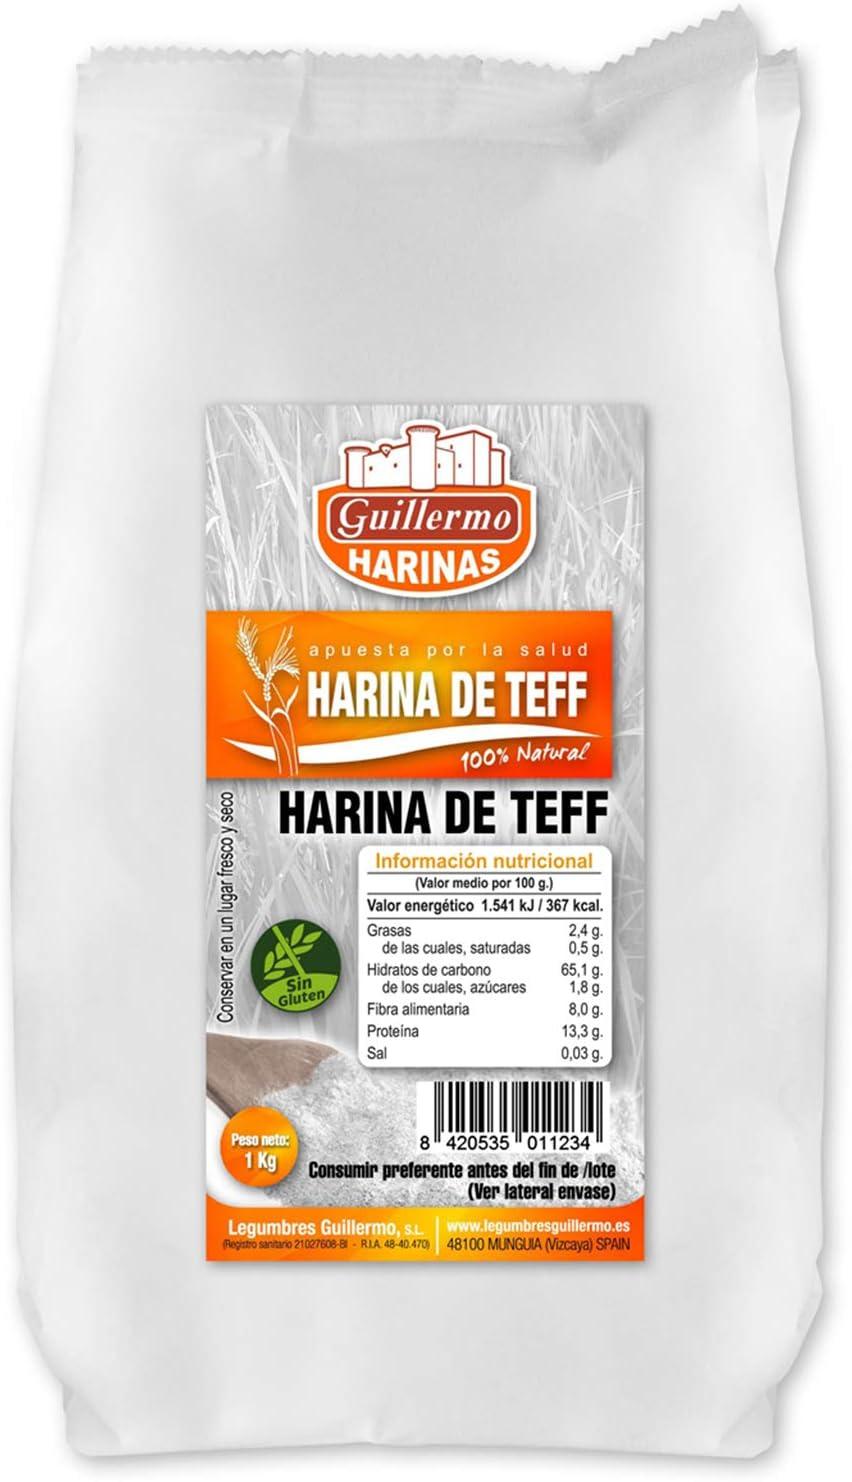 Guillermo Harina de Teff 100% Natural (Pack 3) 1Kg: Amazon.es ...